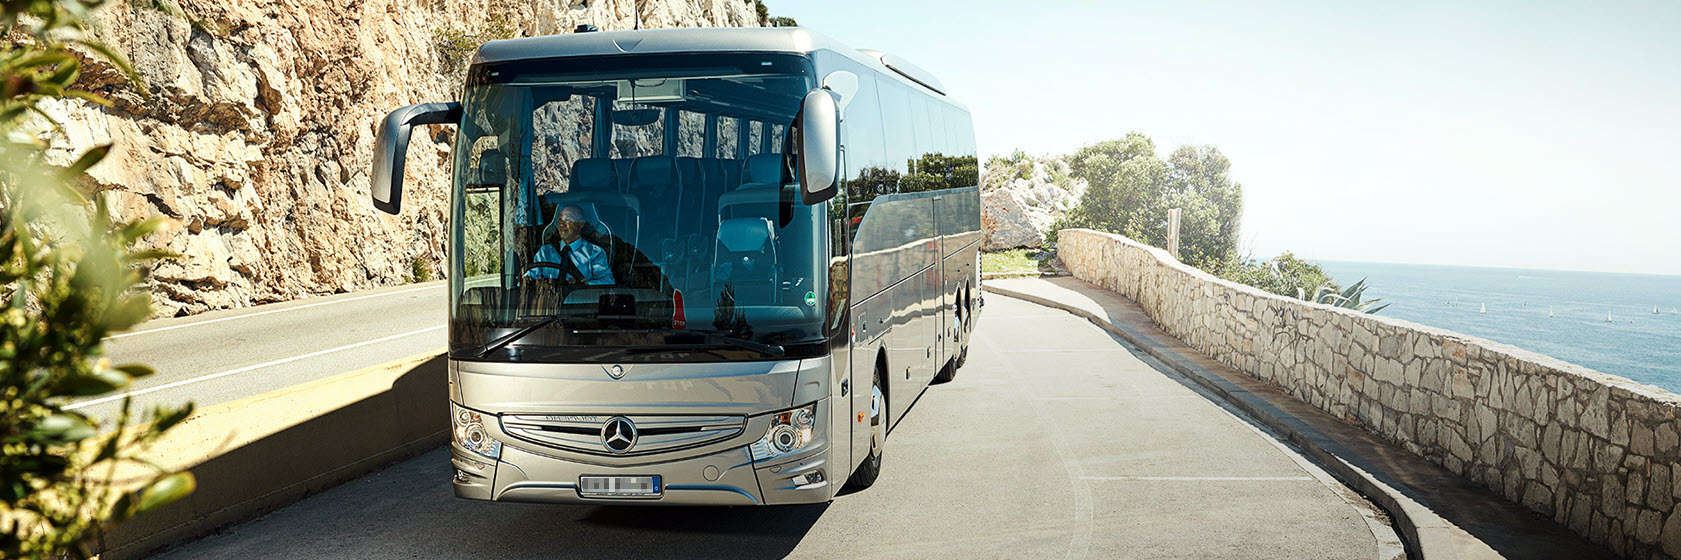 Mercedes 'Tourismo' Team Coach - ABC Coach Hire, Manchester